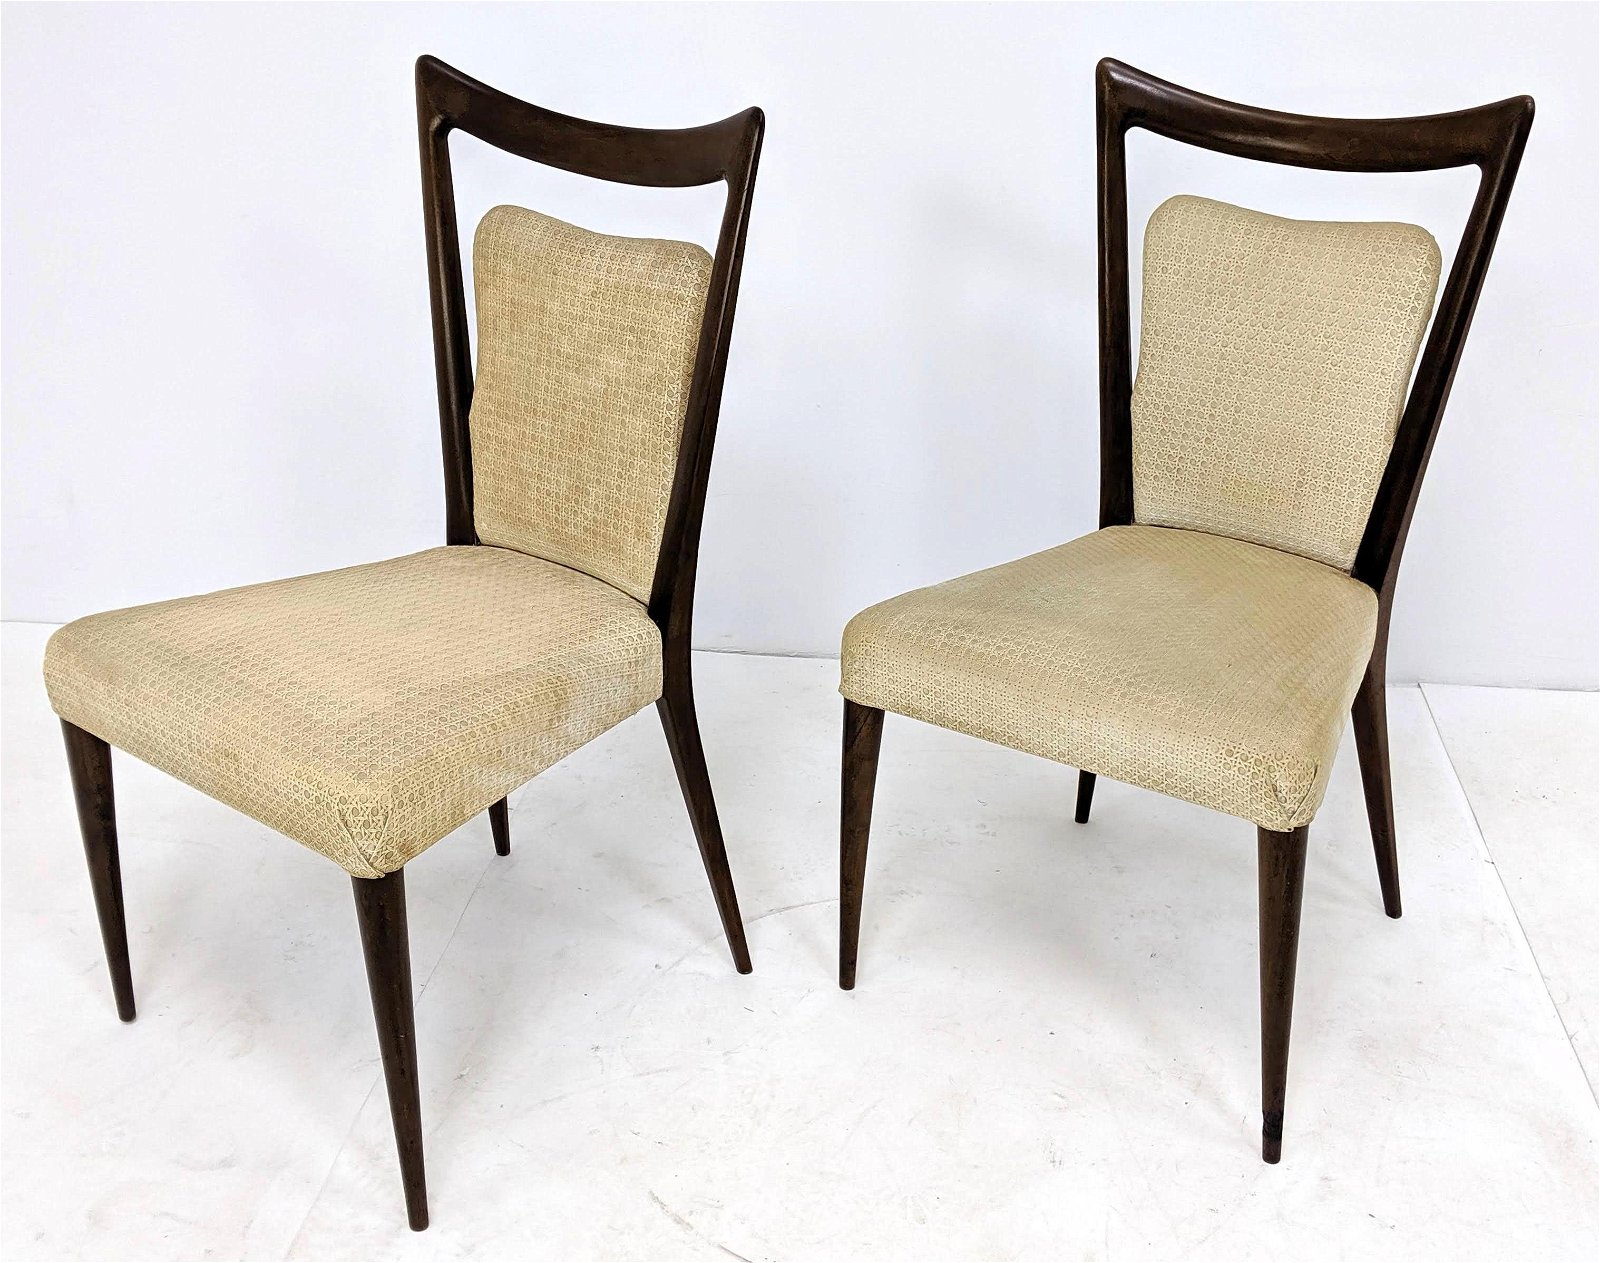 Pr MELCHIORRE BEGA Italian Chairs.  Elegant Wood Frame